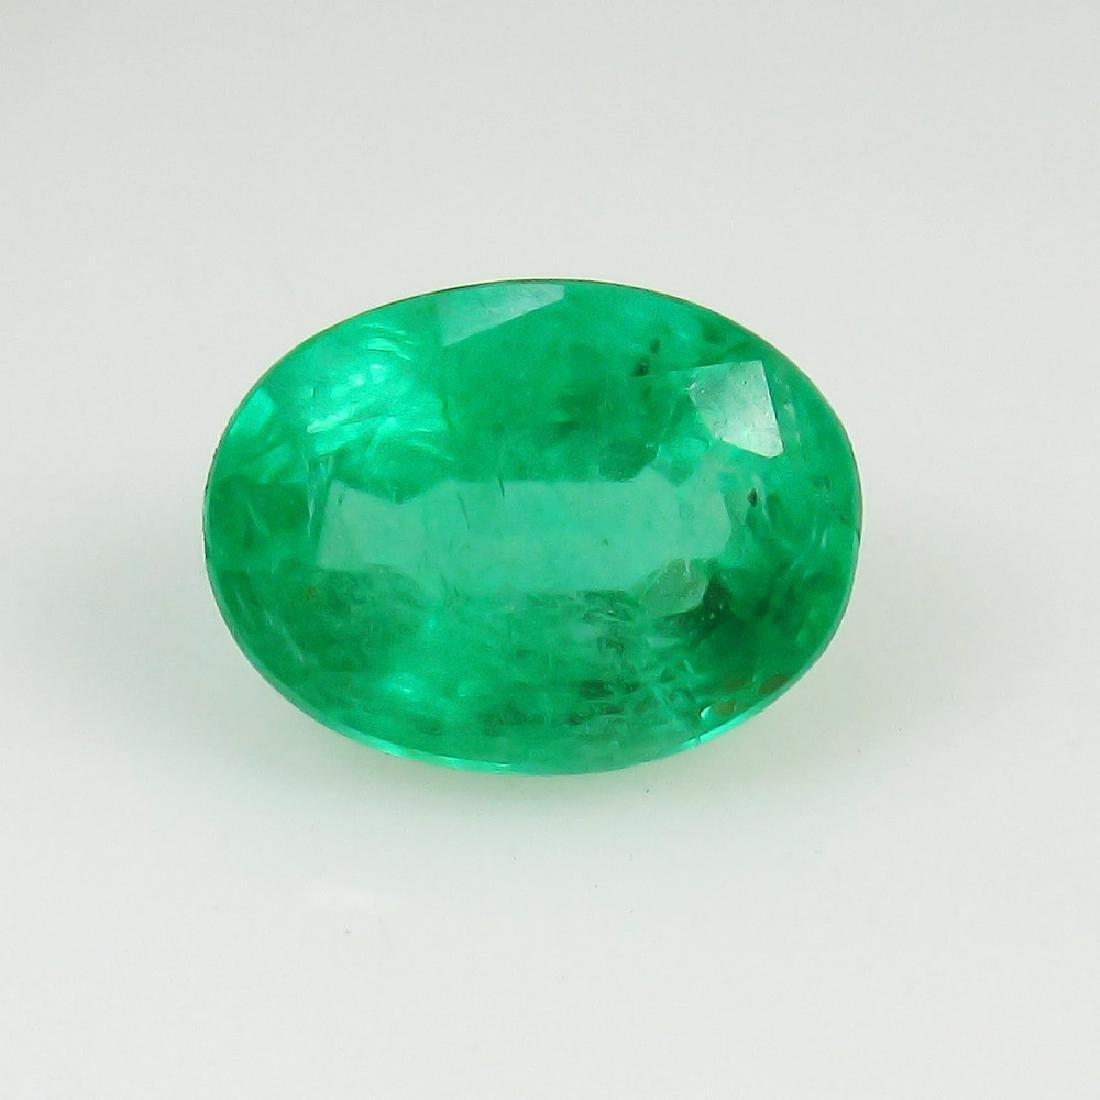 1.73 Ct Genuine Loose Zambian Emerald Nice Oval cut Top